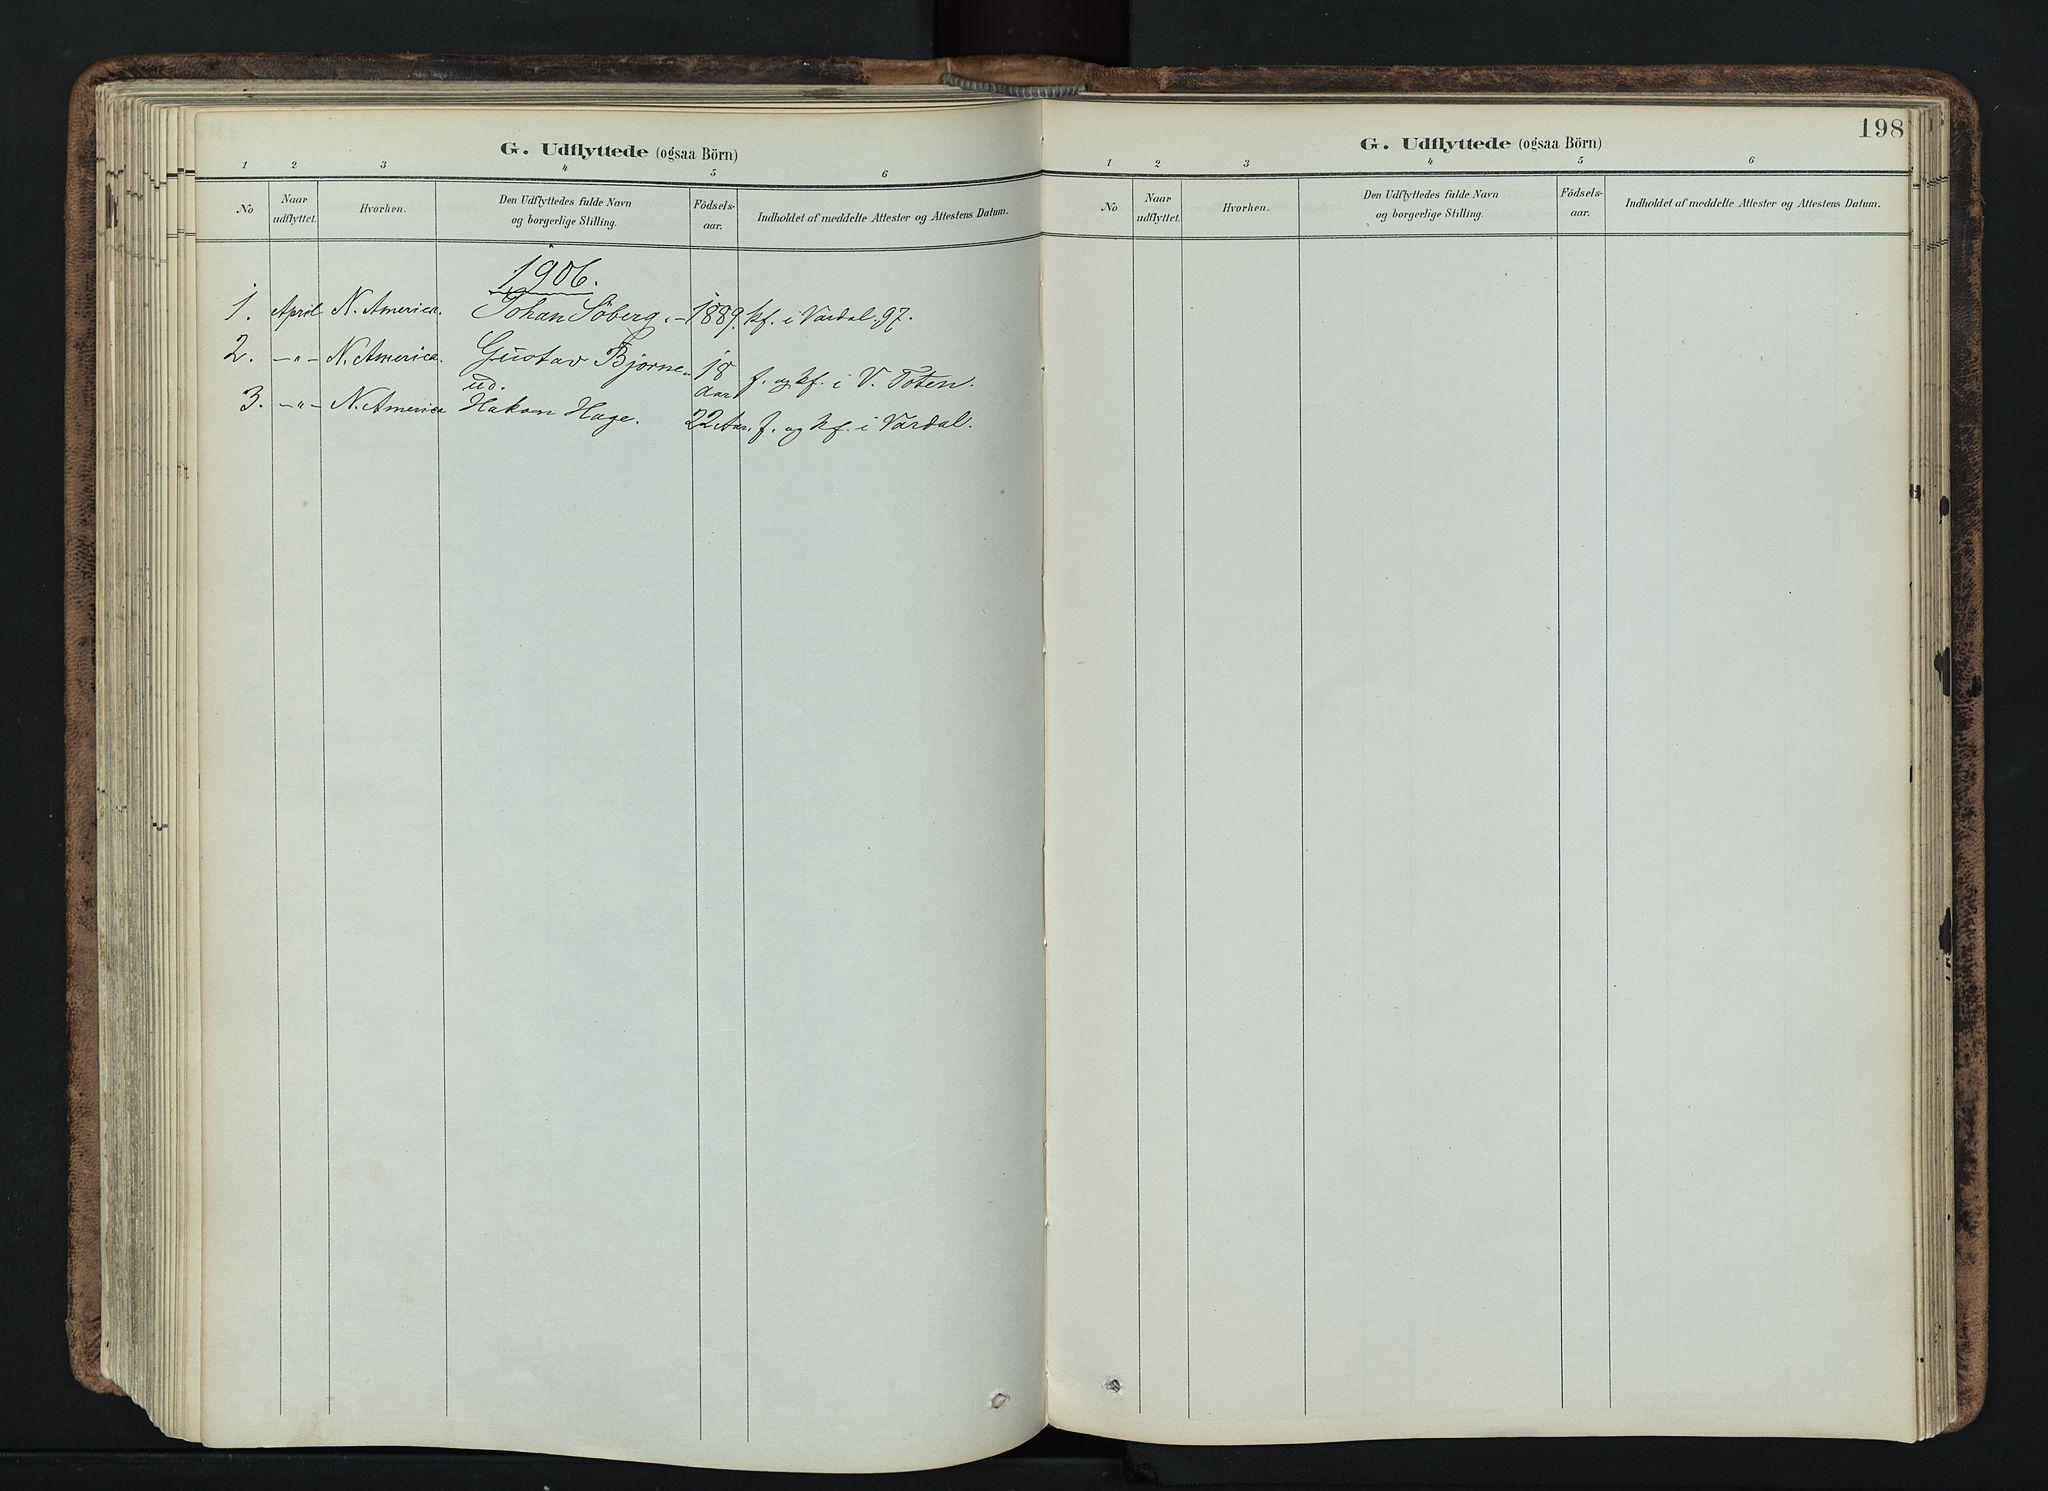 SAH, Vardal prestekontor, H/Ha/Haa/L0019: Ministerialbok nr. 19, 1893-1907, s. 198